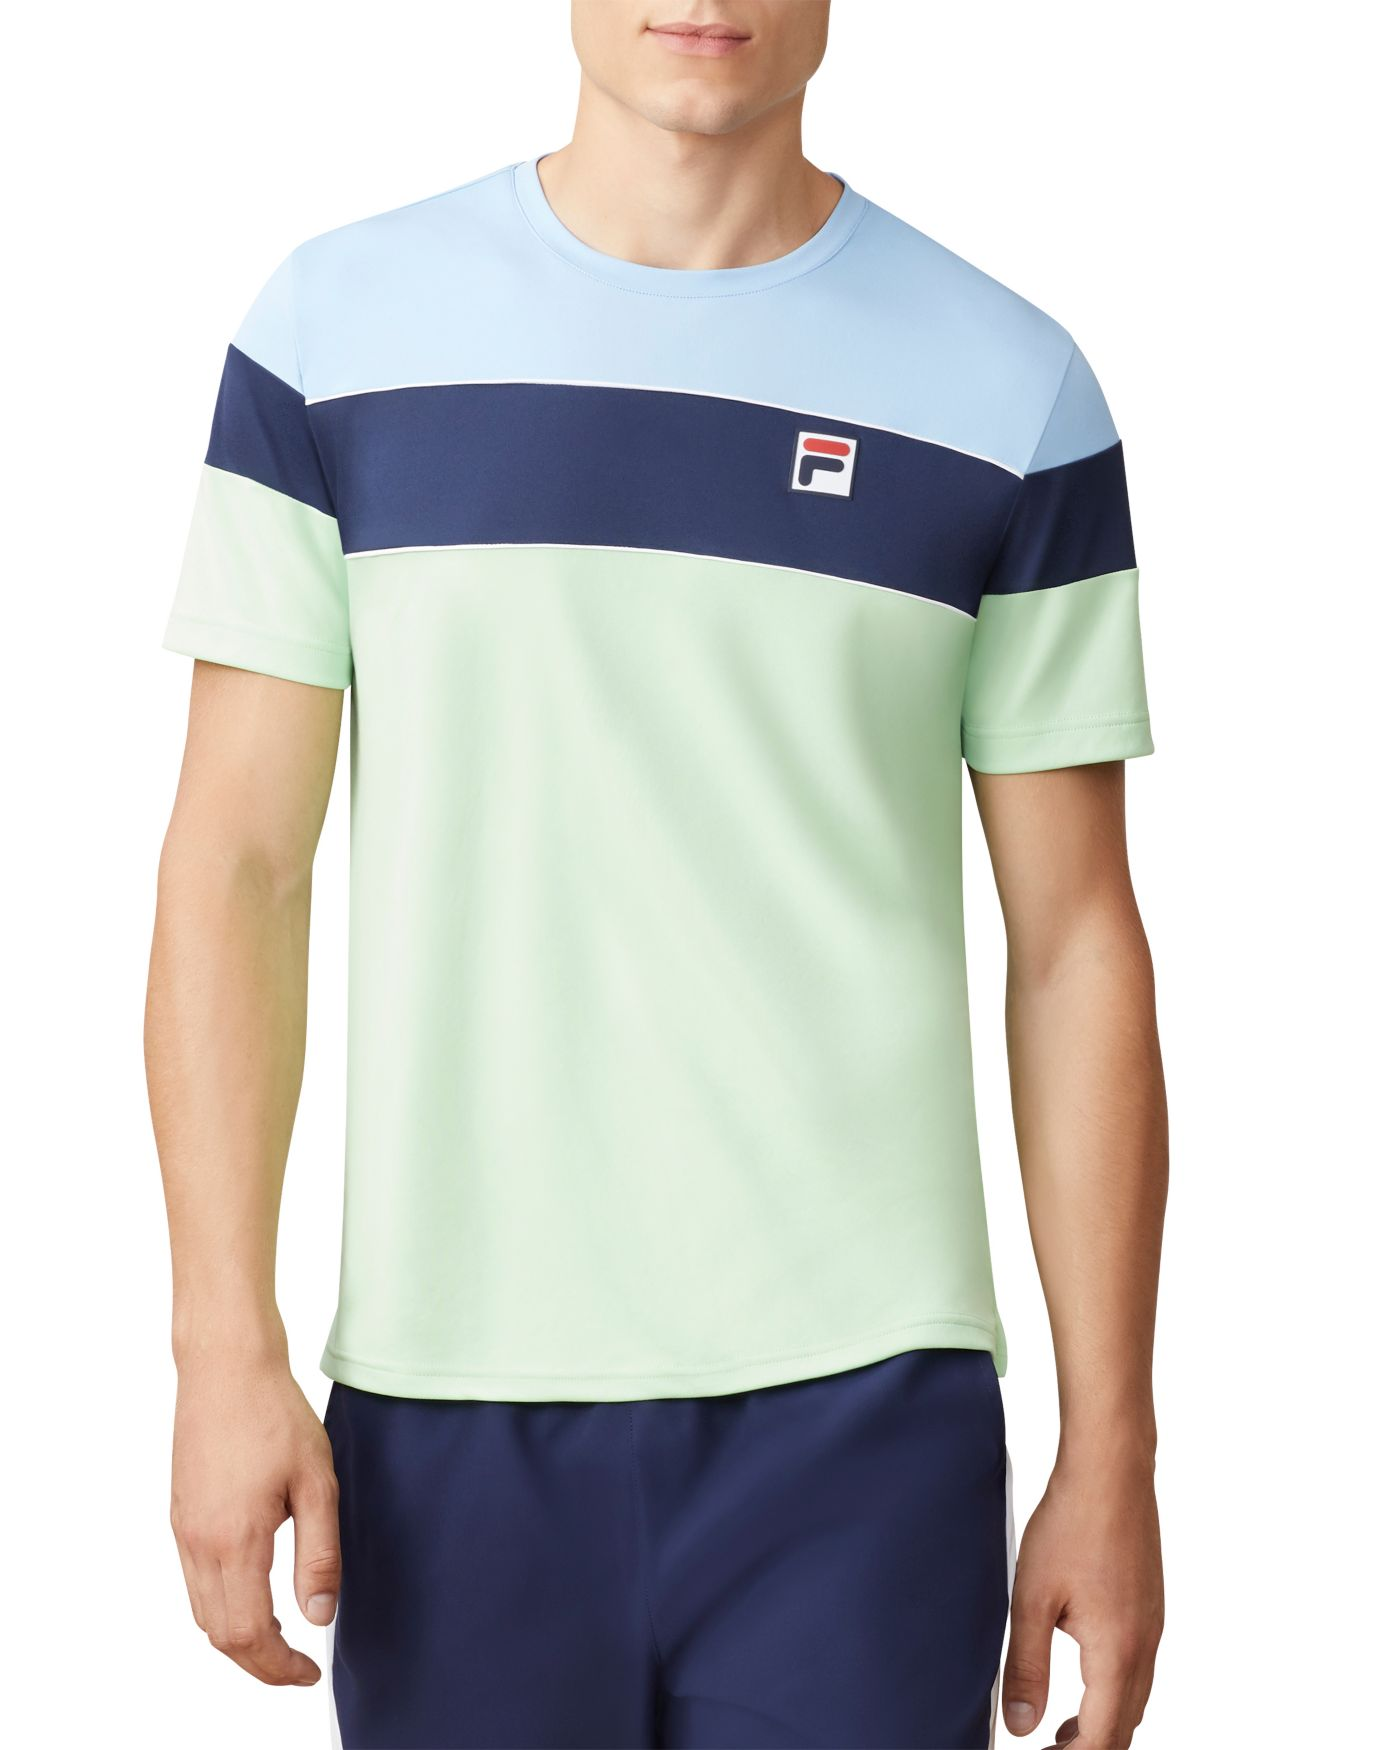 Fila Men's Legend Colorblock Tennis Shirt